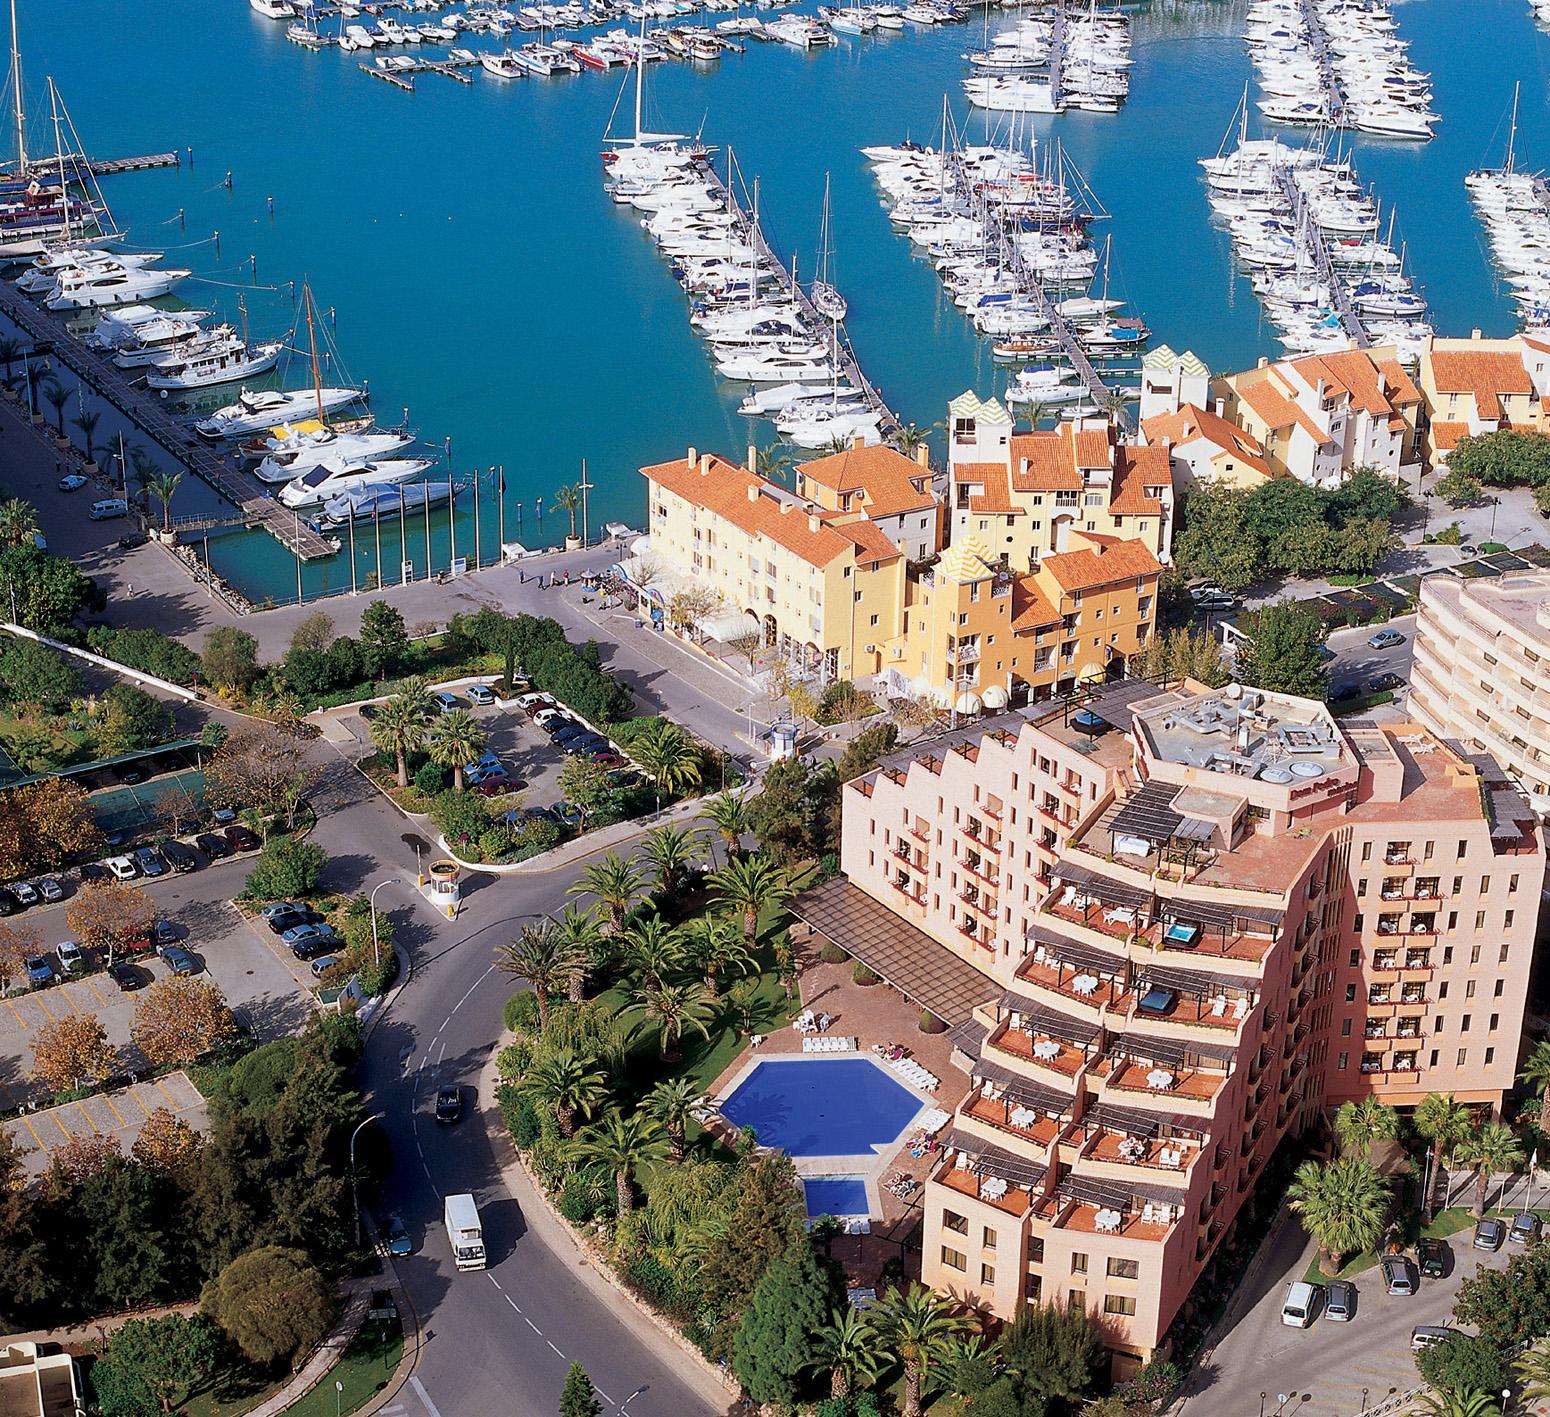 Dom Pedro Marina Boutique Hotel And Golf Vilamoura Algarve Portugal